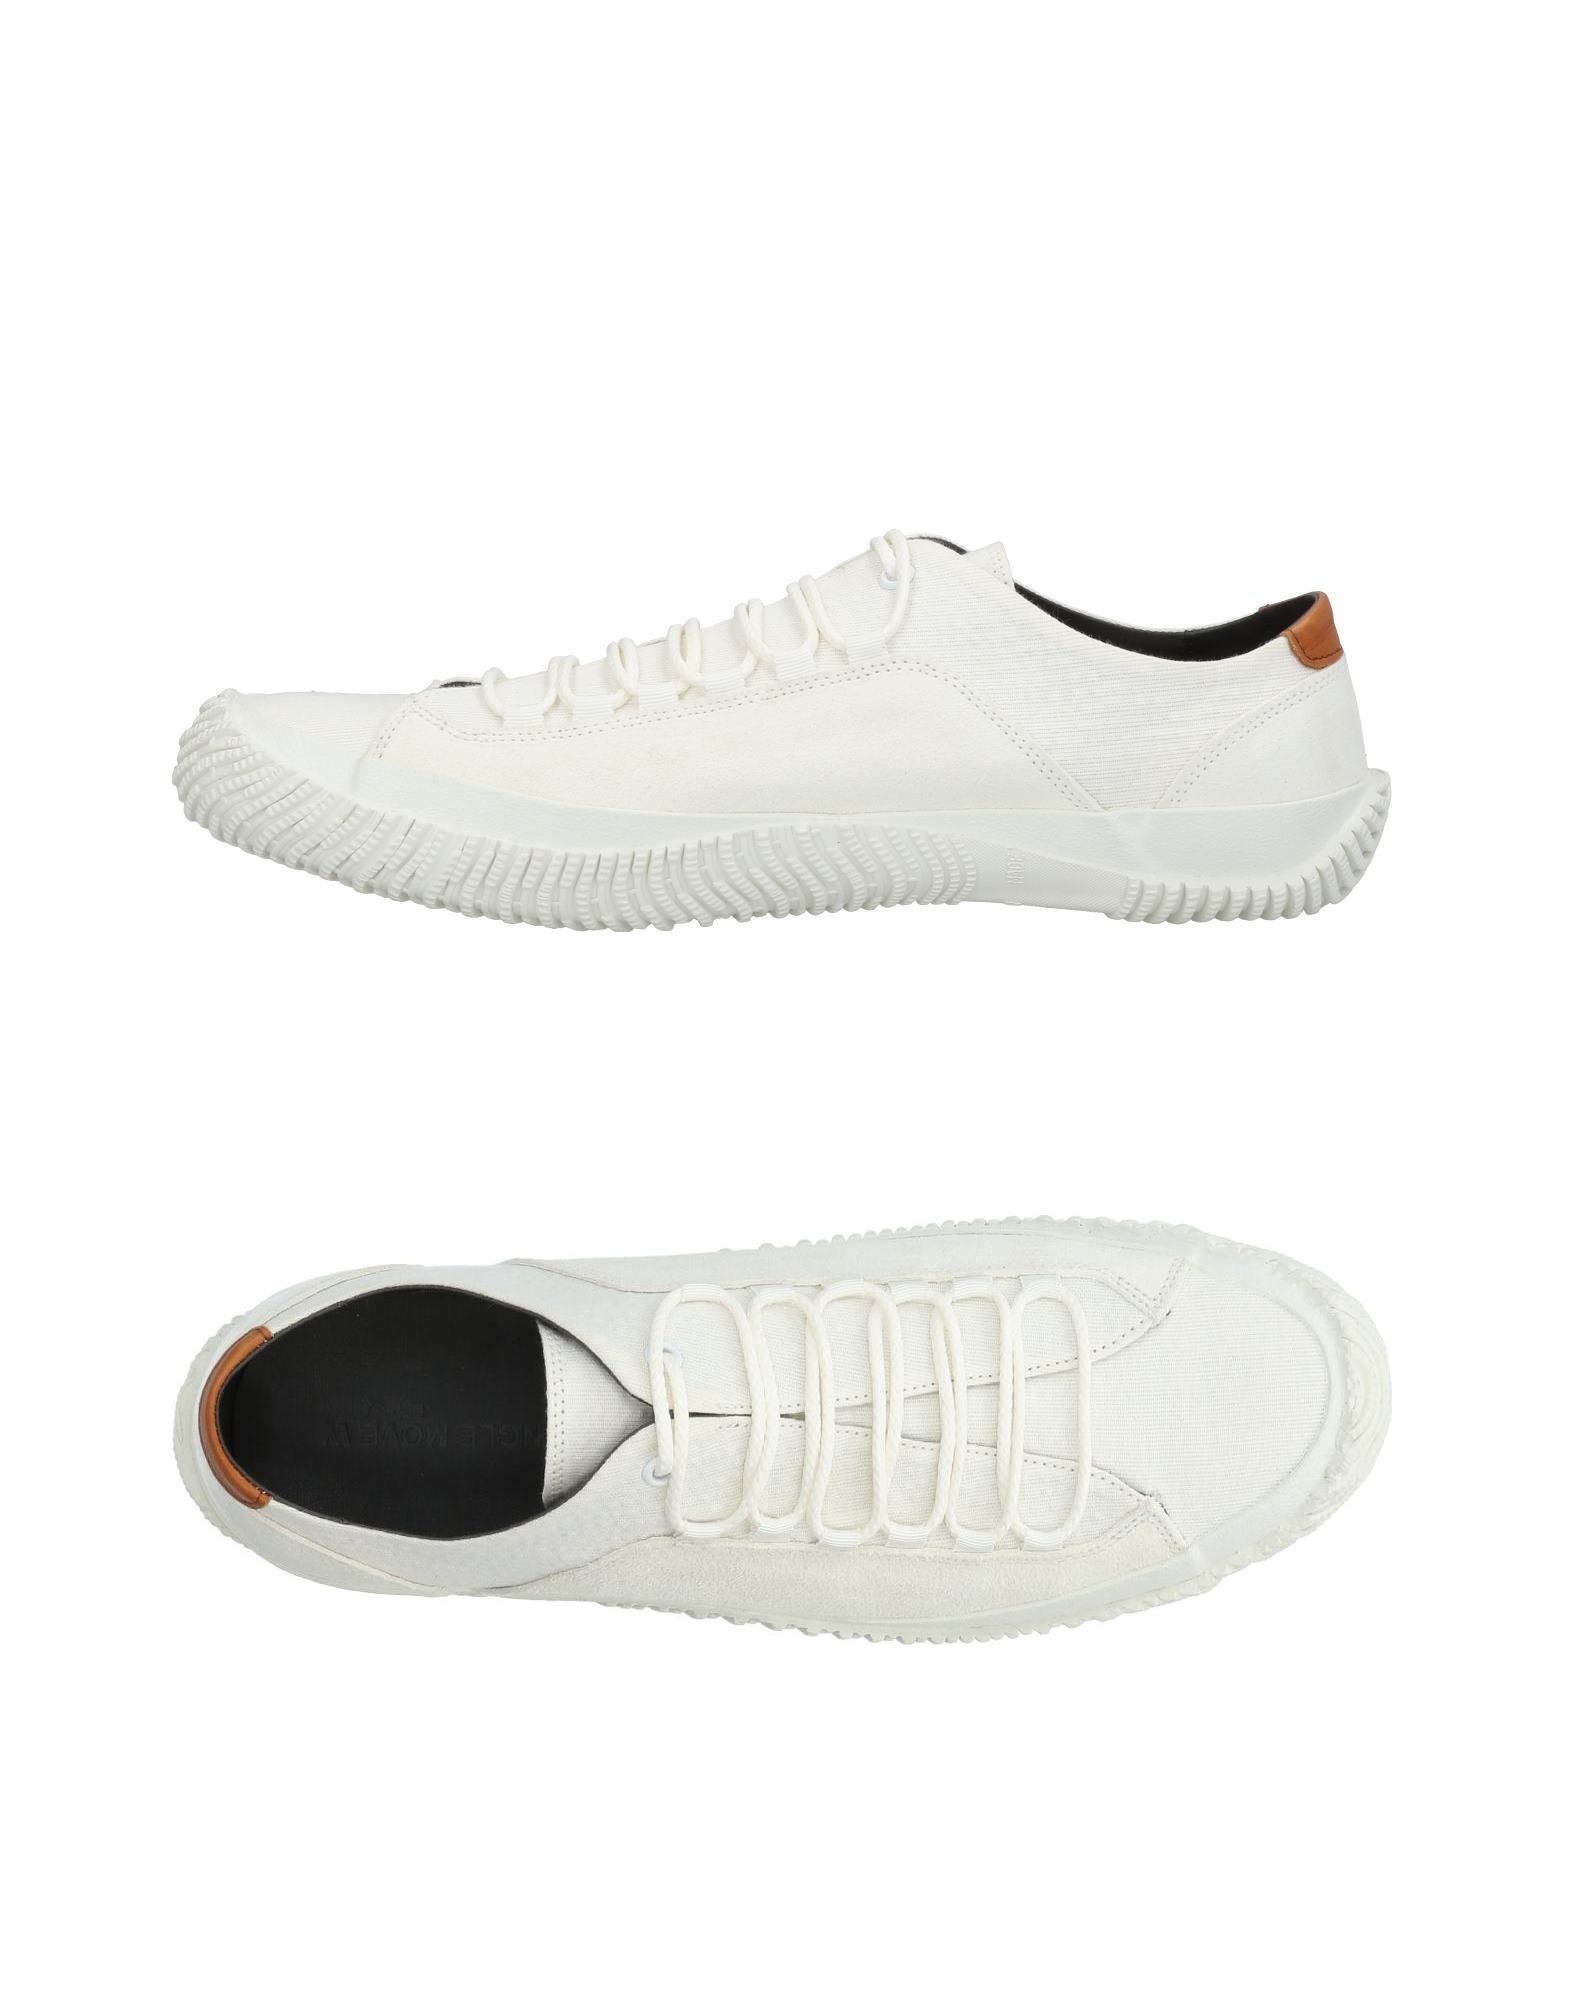 Spingle Move W Sneakers Herren  11440249LX Neue Schuhe